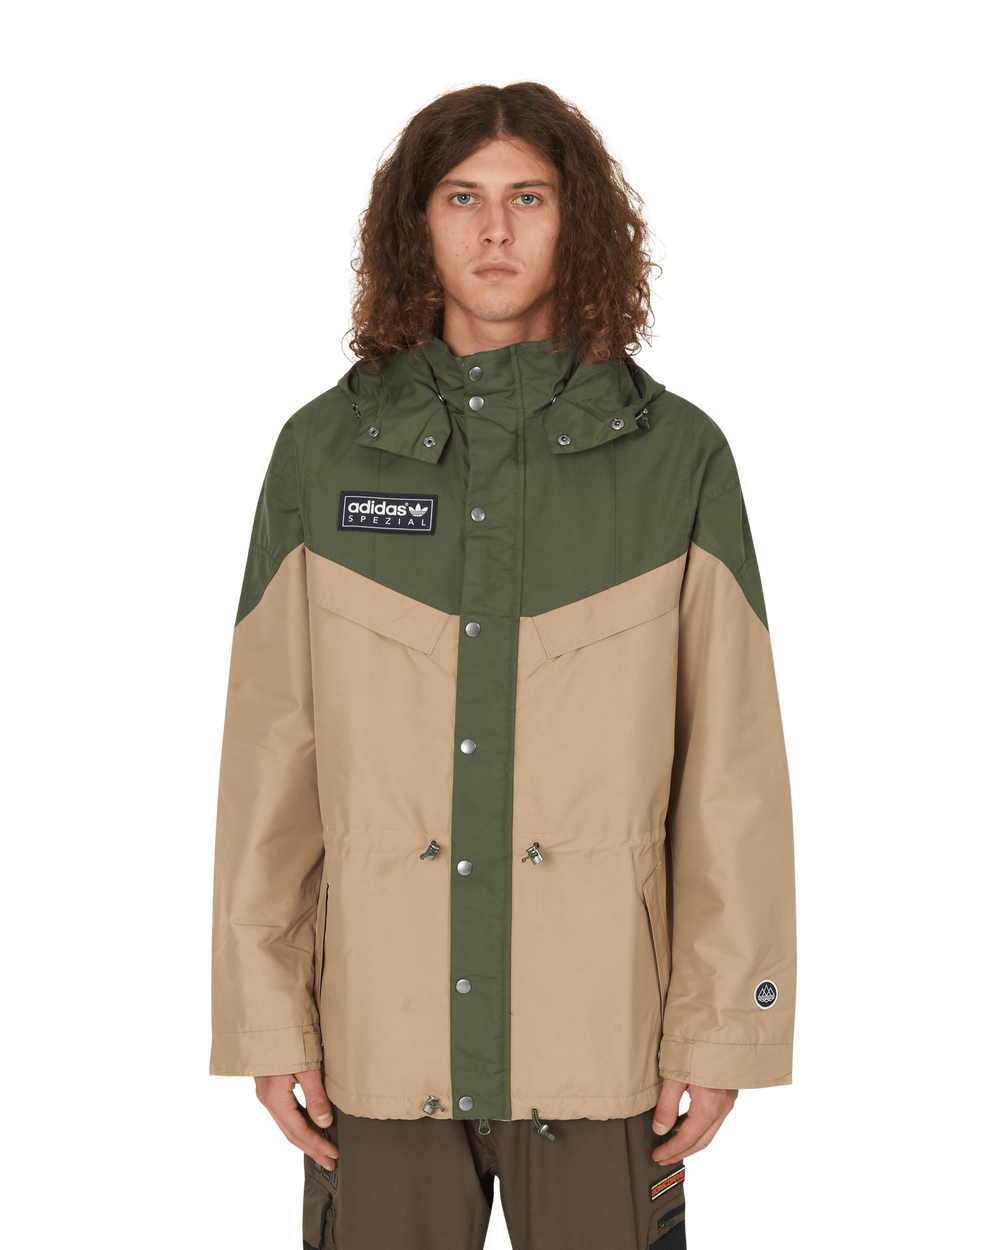 Spezial Belthorn Anorak - Parka Jackets